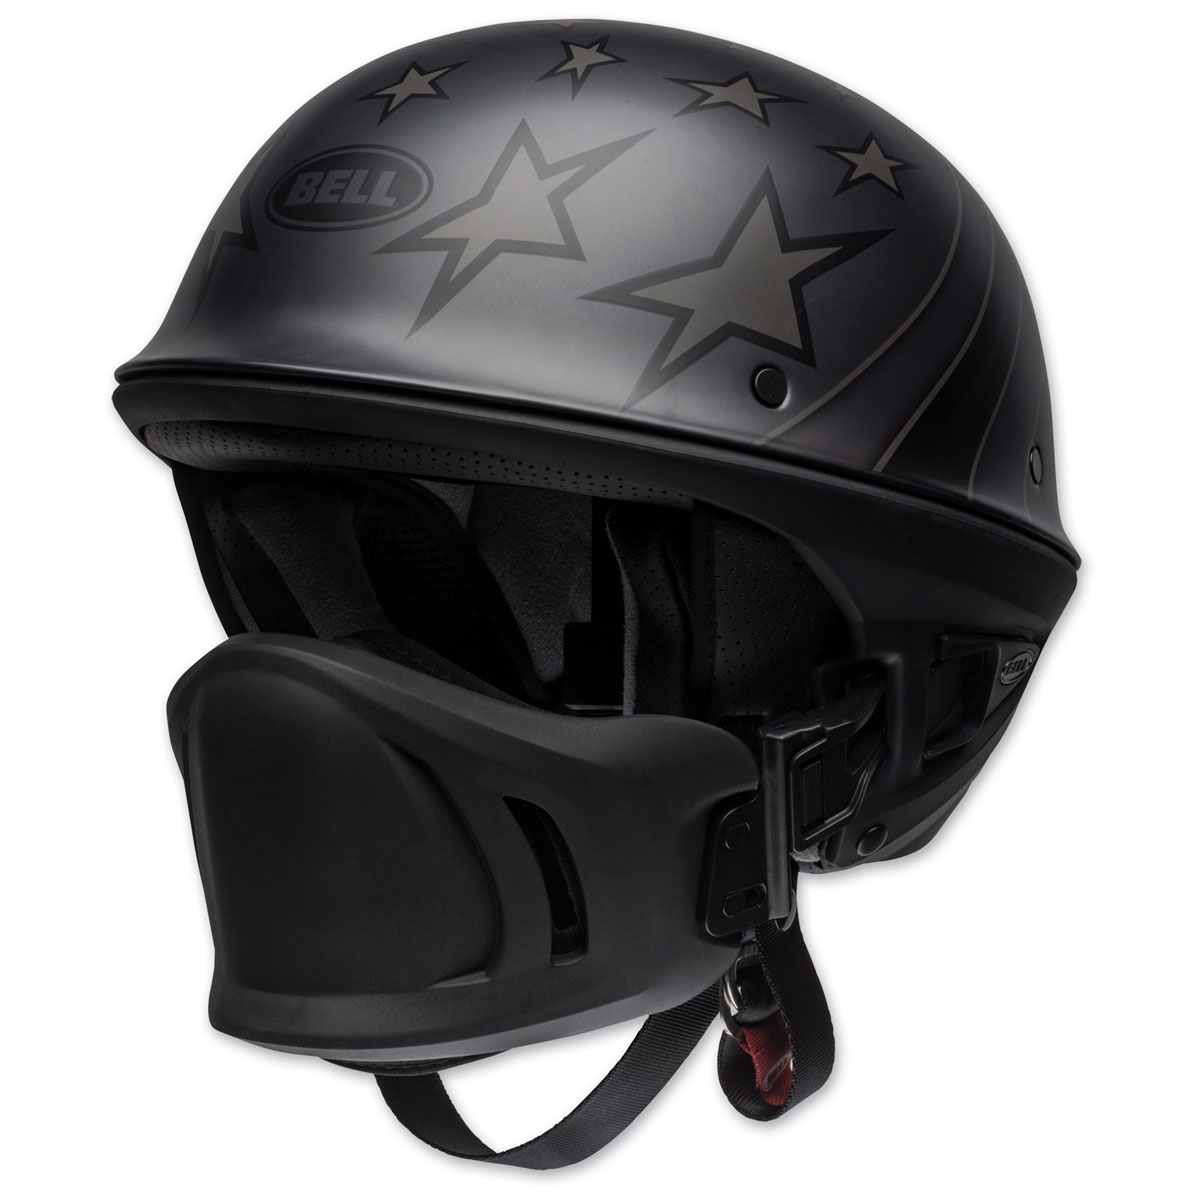 Bell Rogue Honor Half Helmet